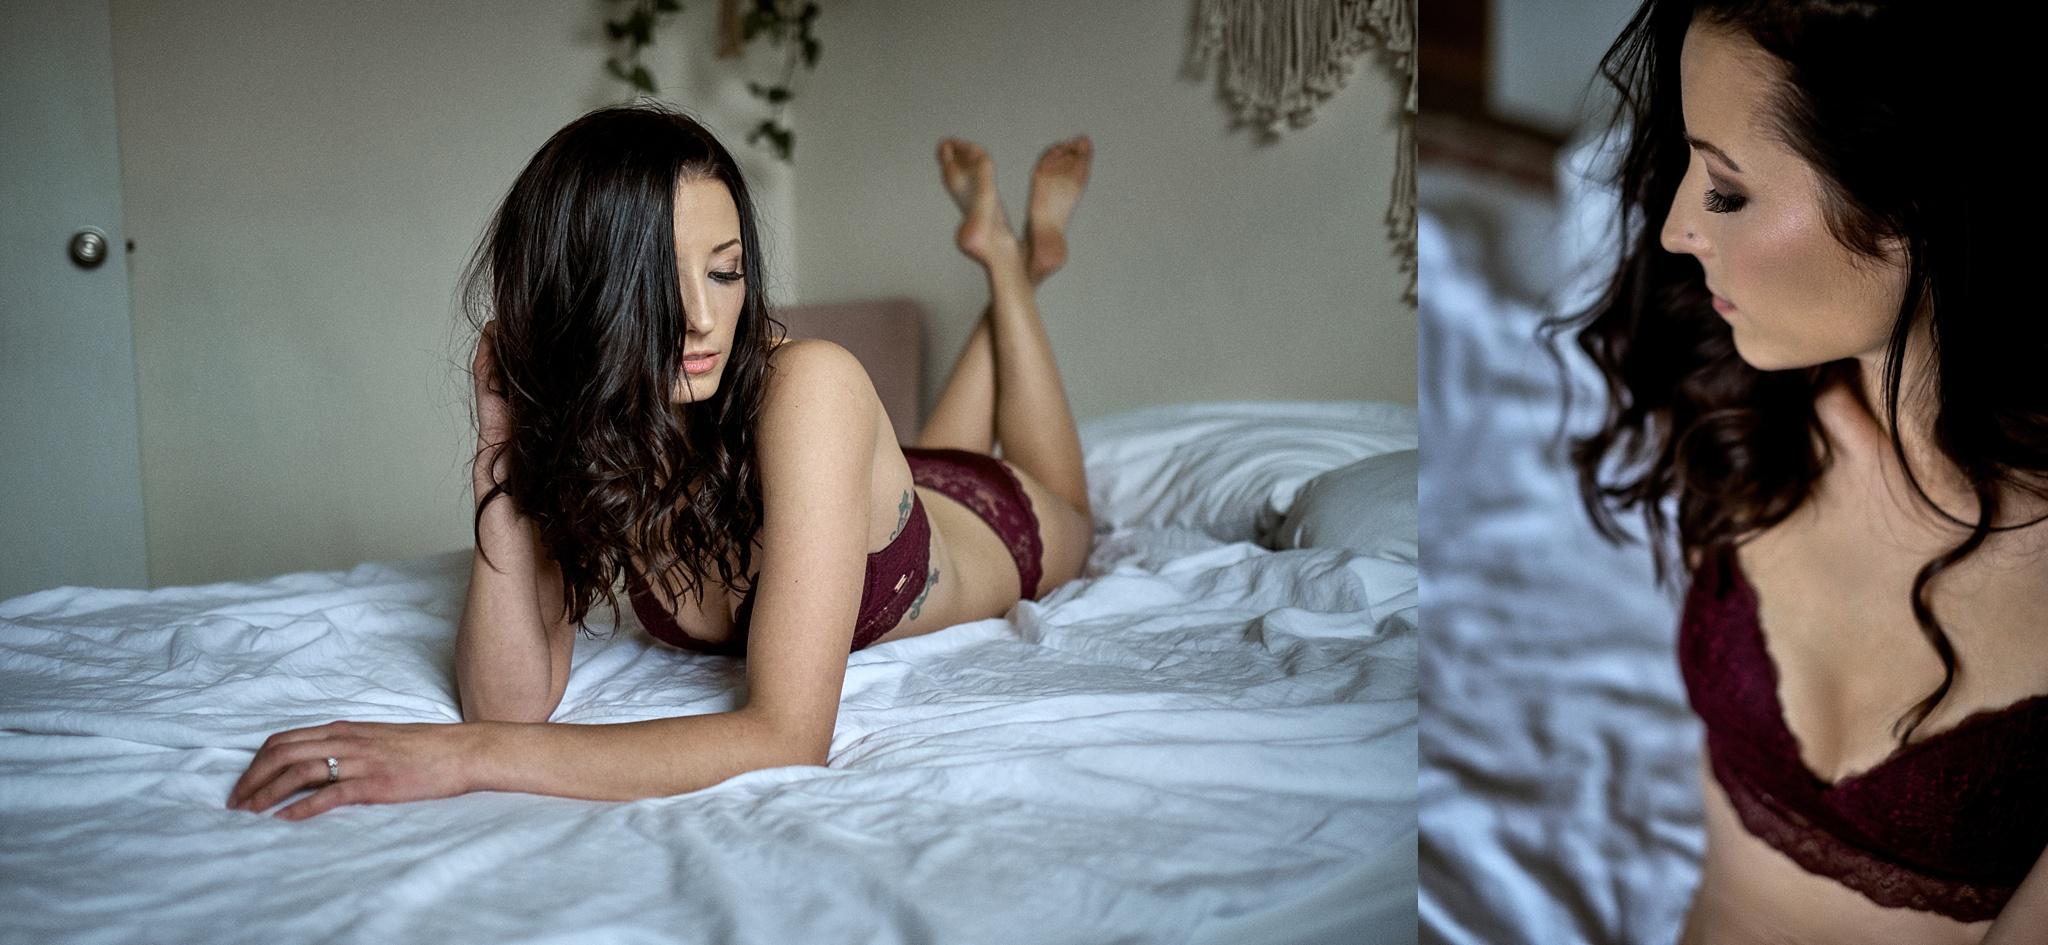 boudoir-photography-southern-wi-northern-il_09.jpg